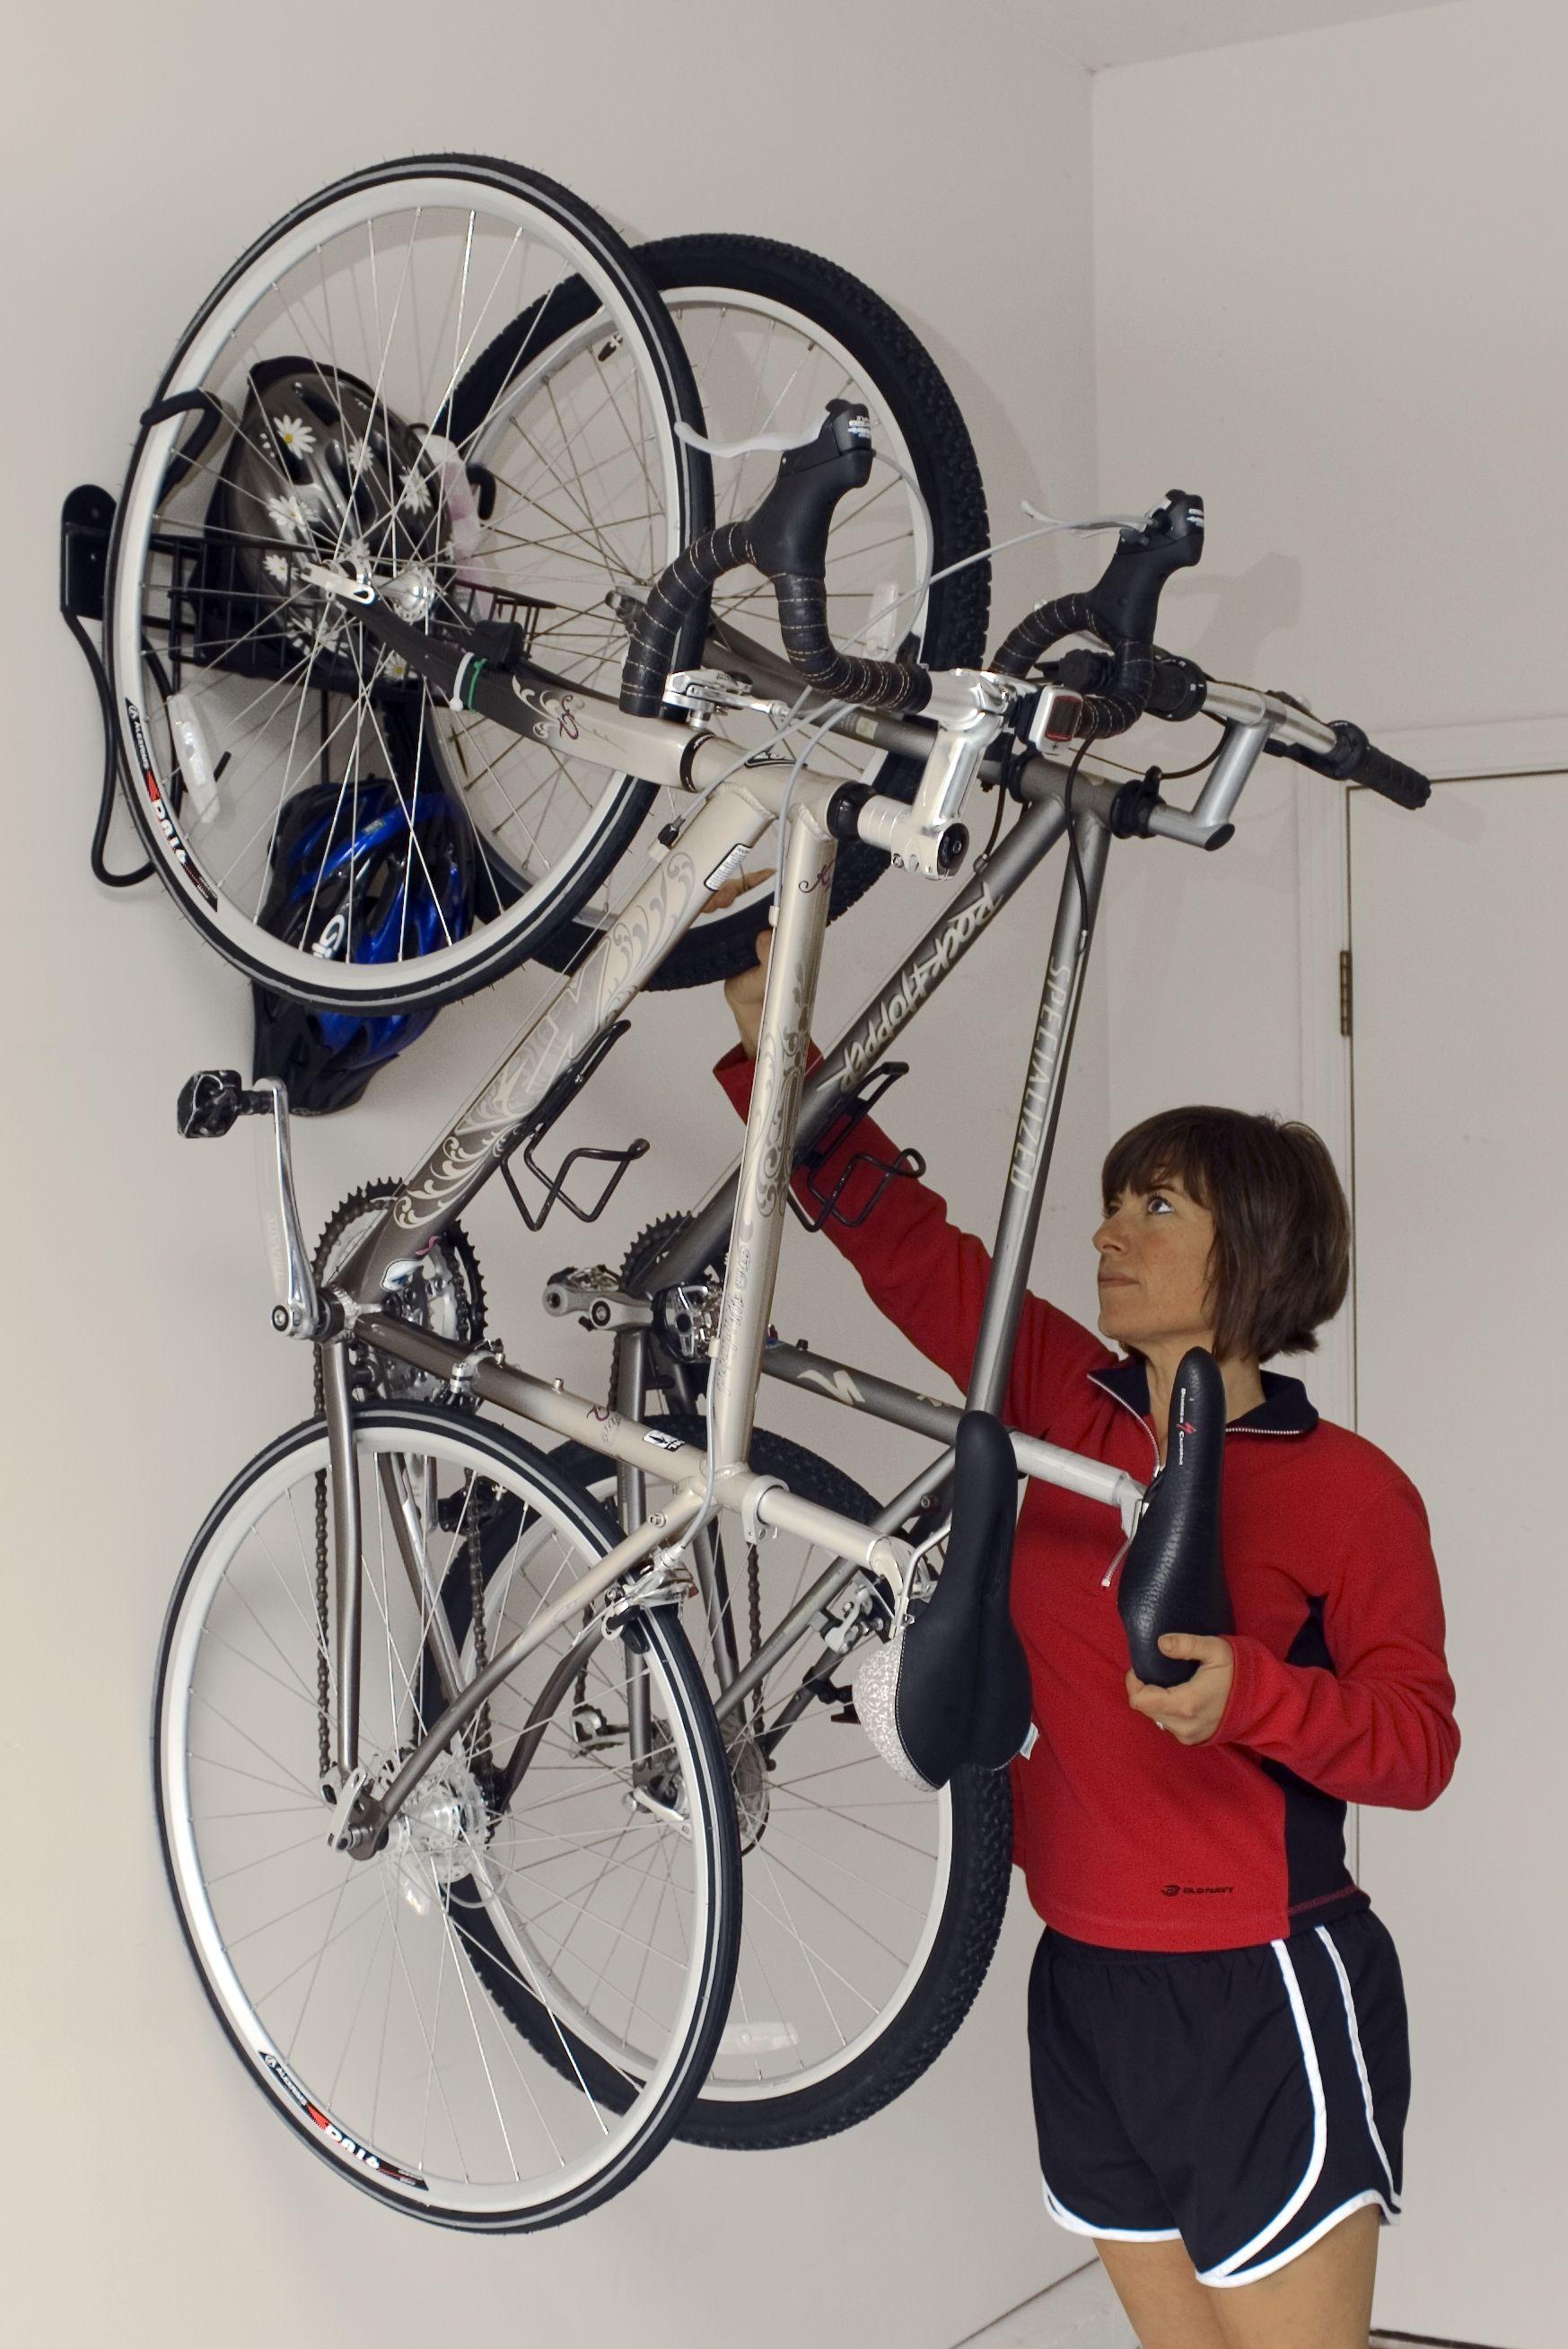 churchtelemessagingsystem bike walmart bikes rack racks kuat full for x com at of rear mountain garage size